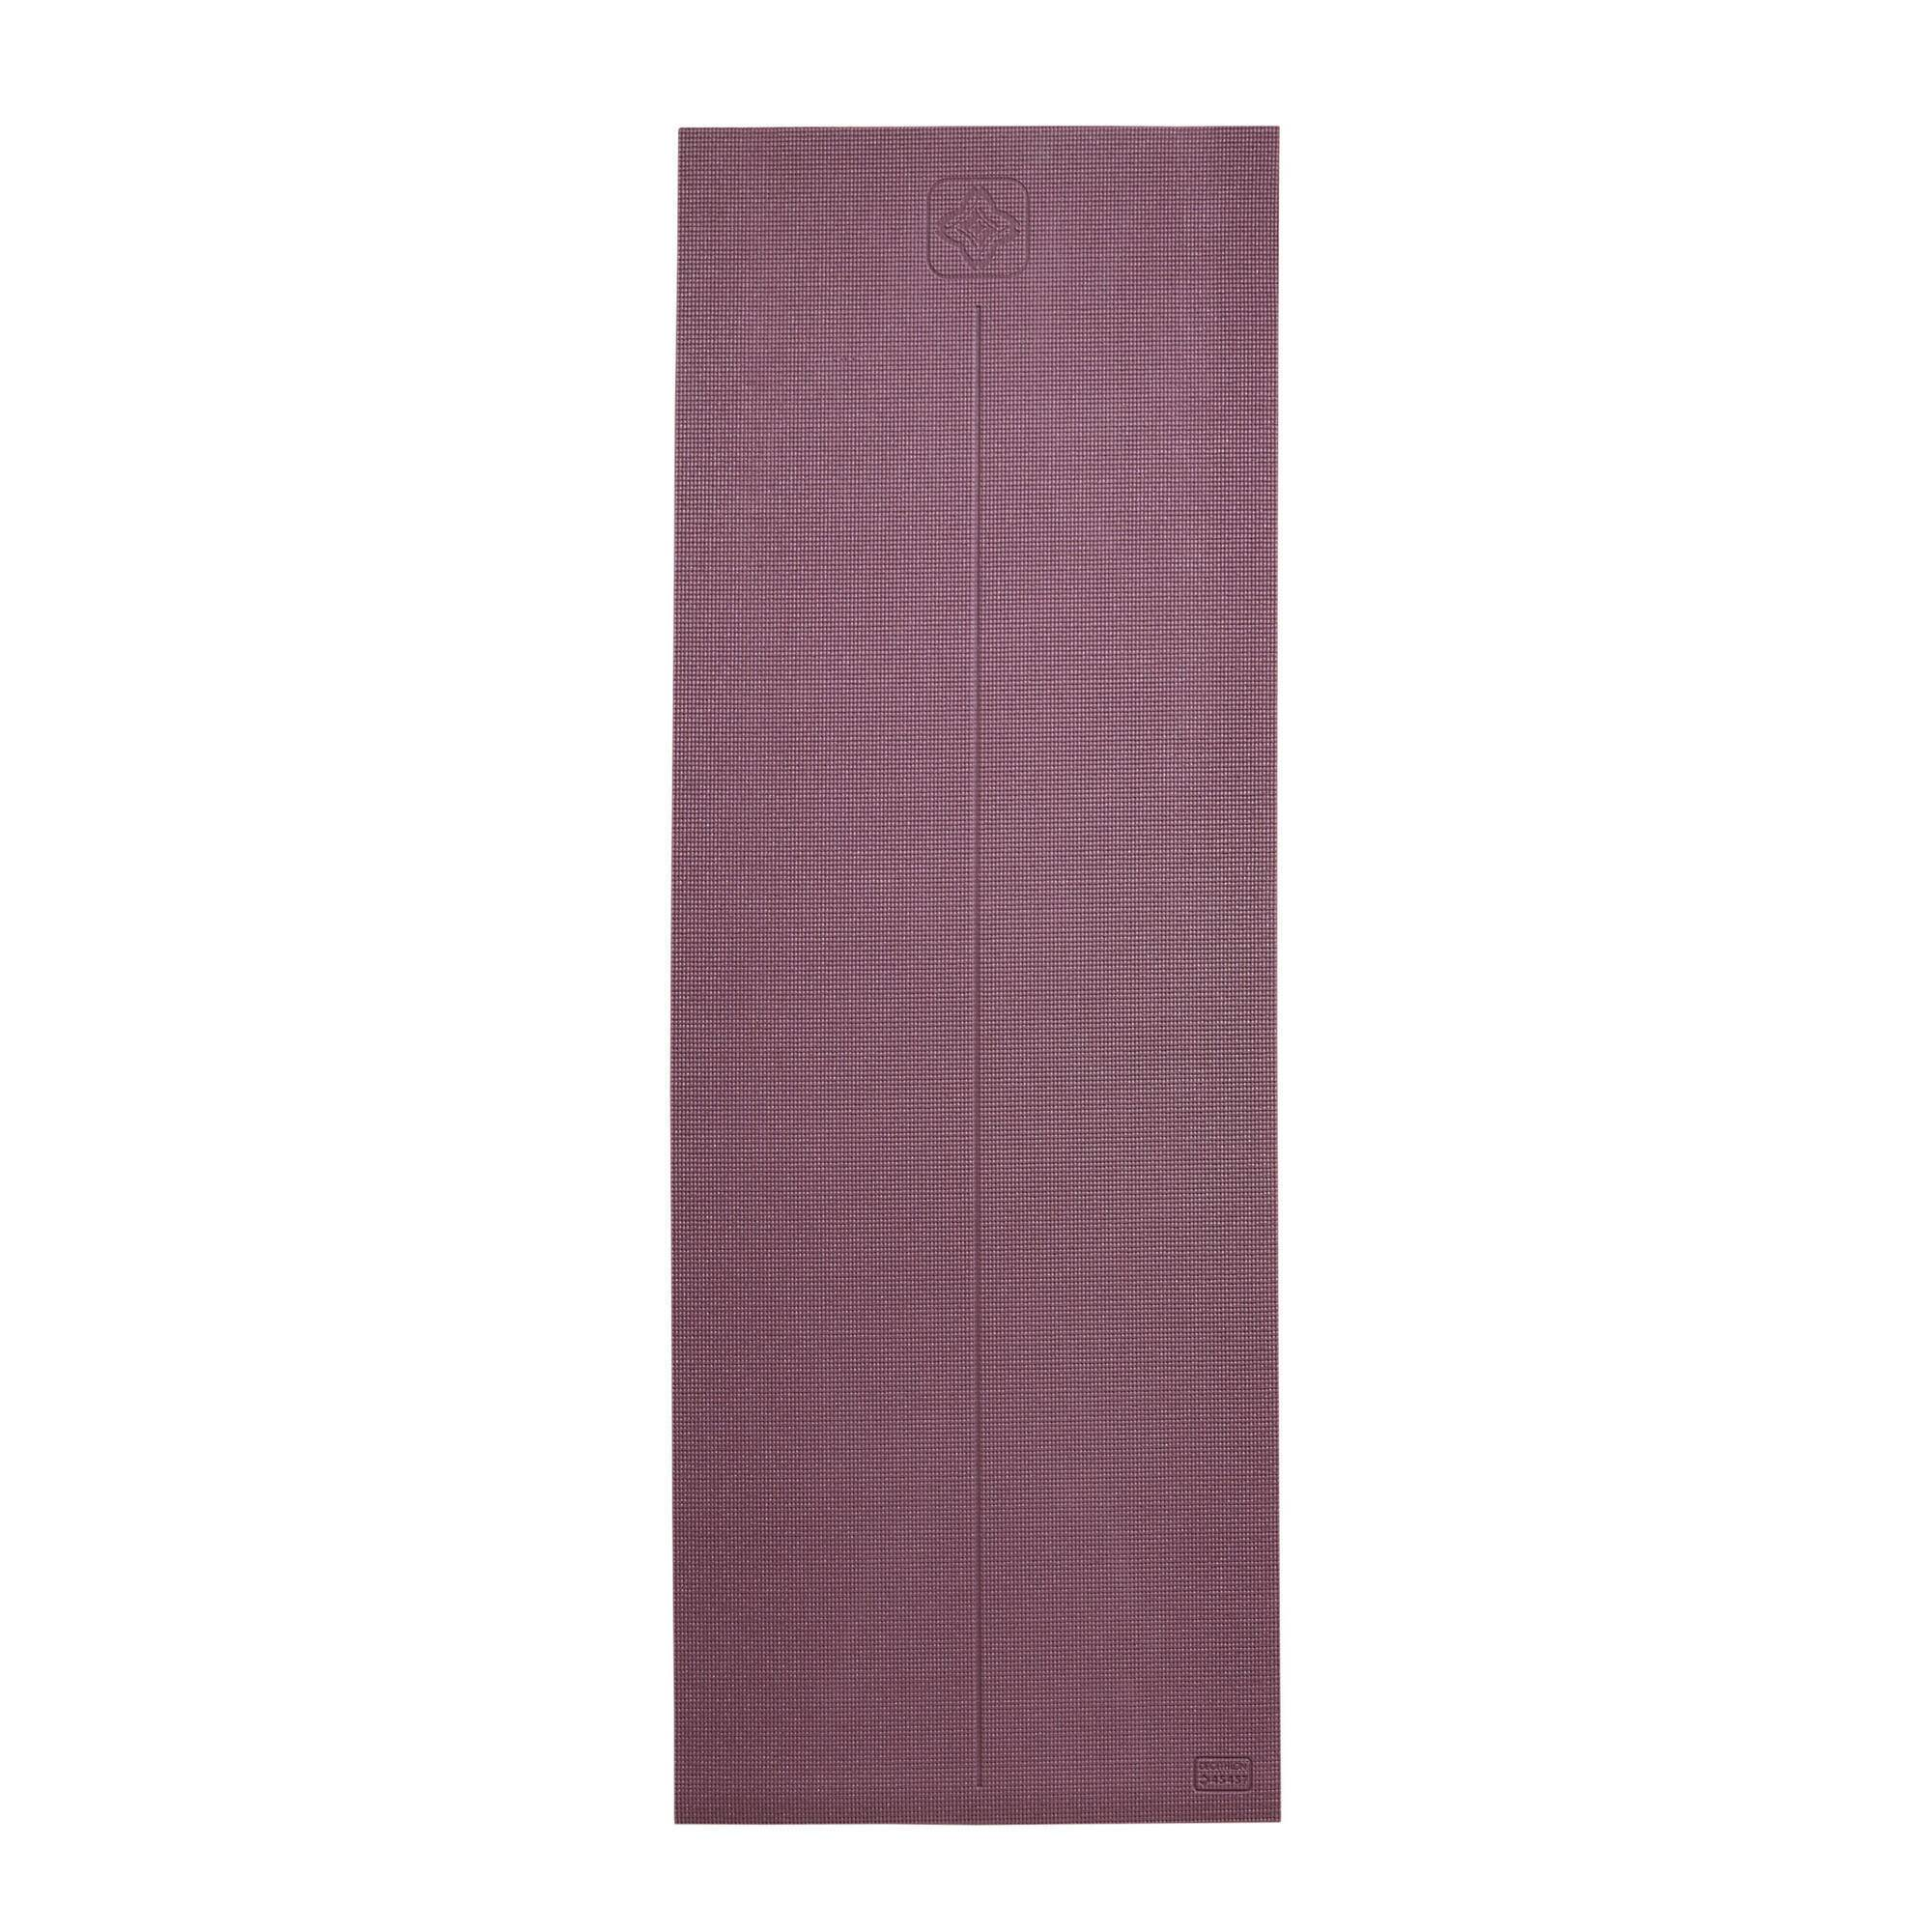 kimjaly tappetino yoga comfort 8mm bordeaux 173x61cm